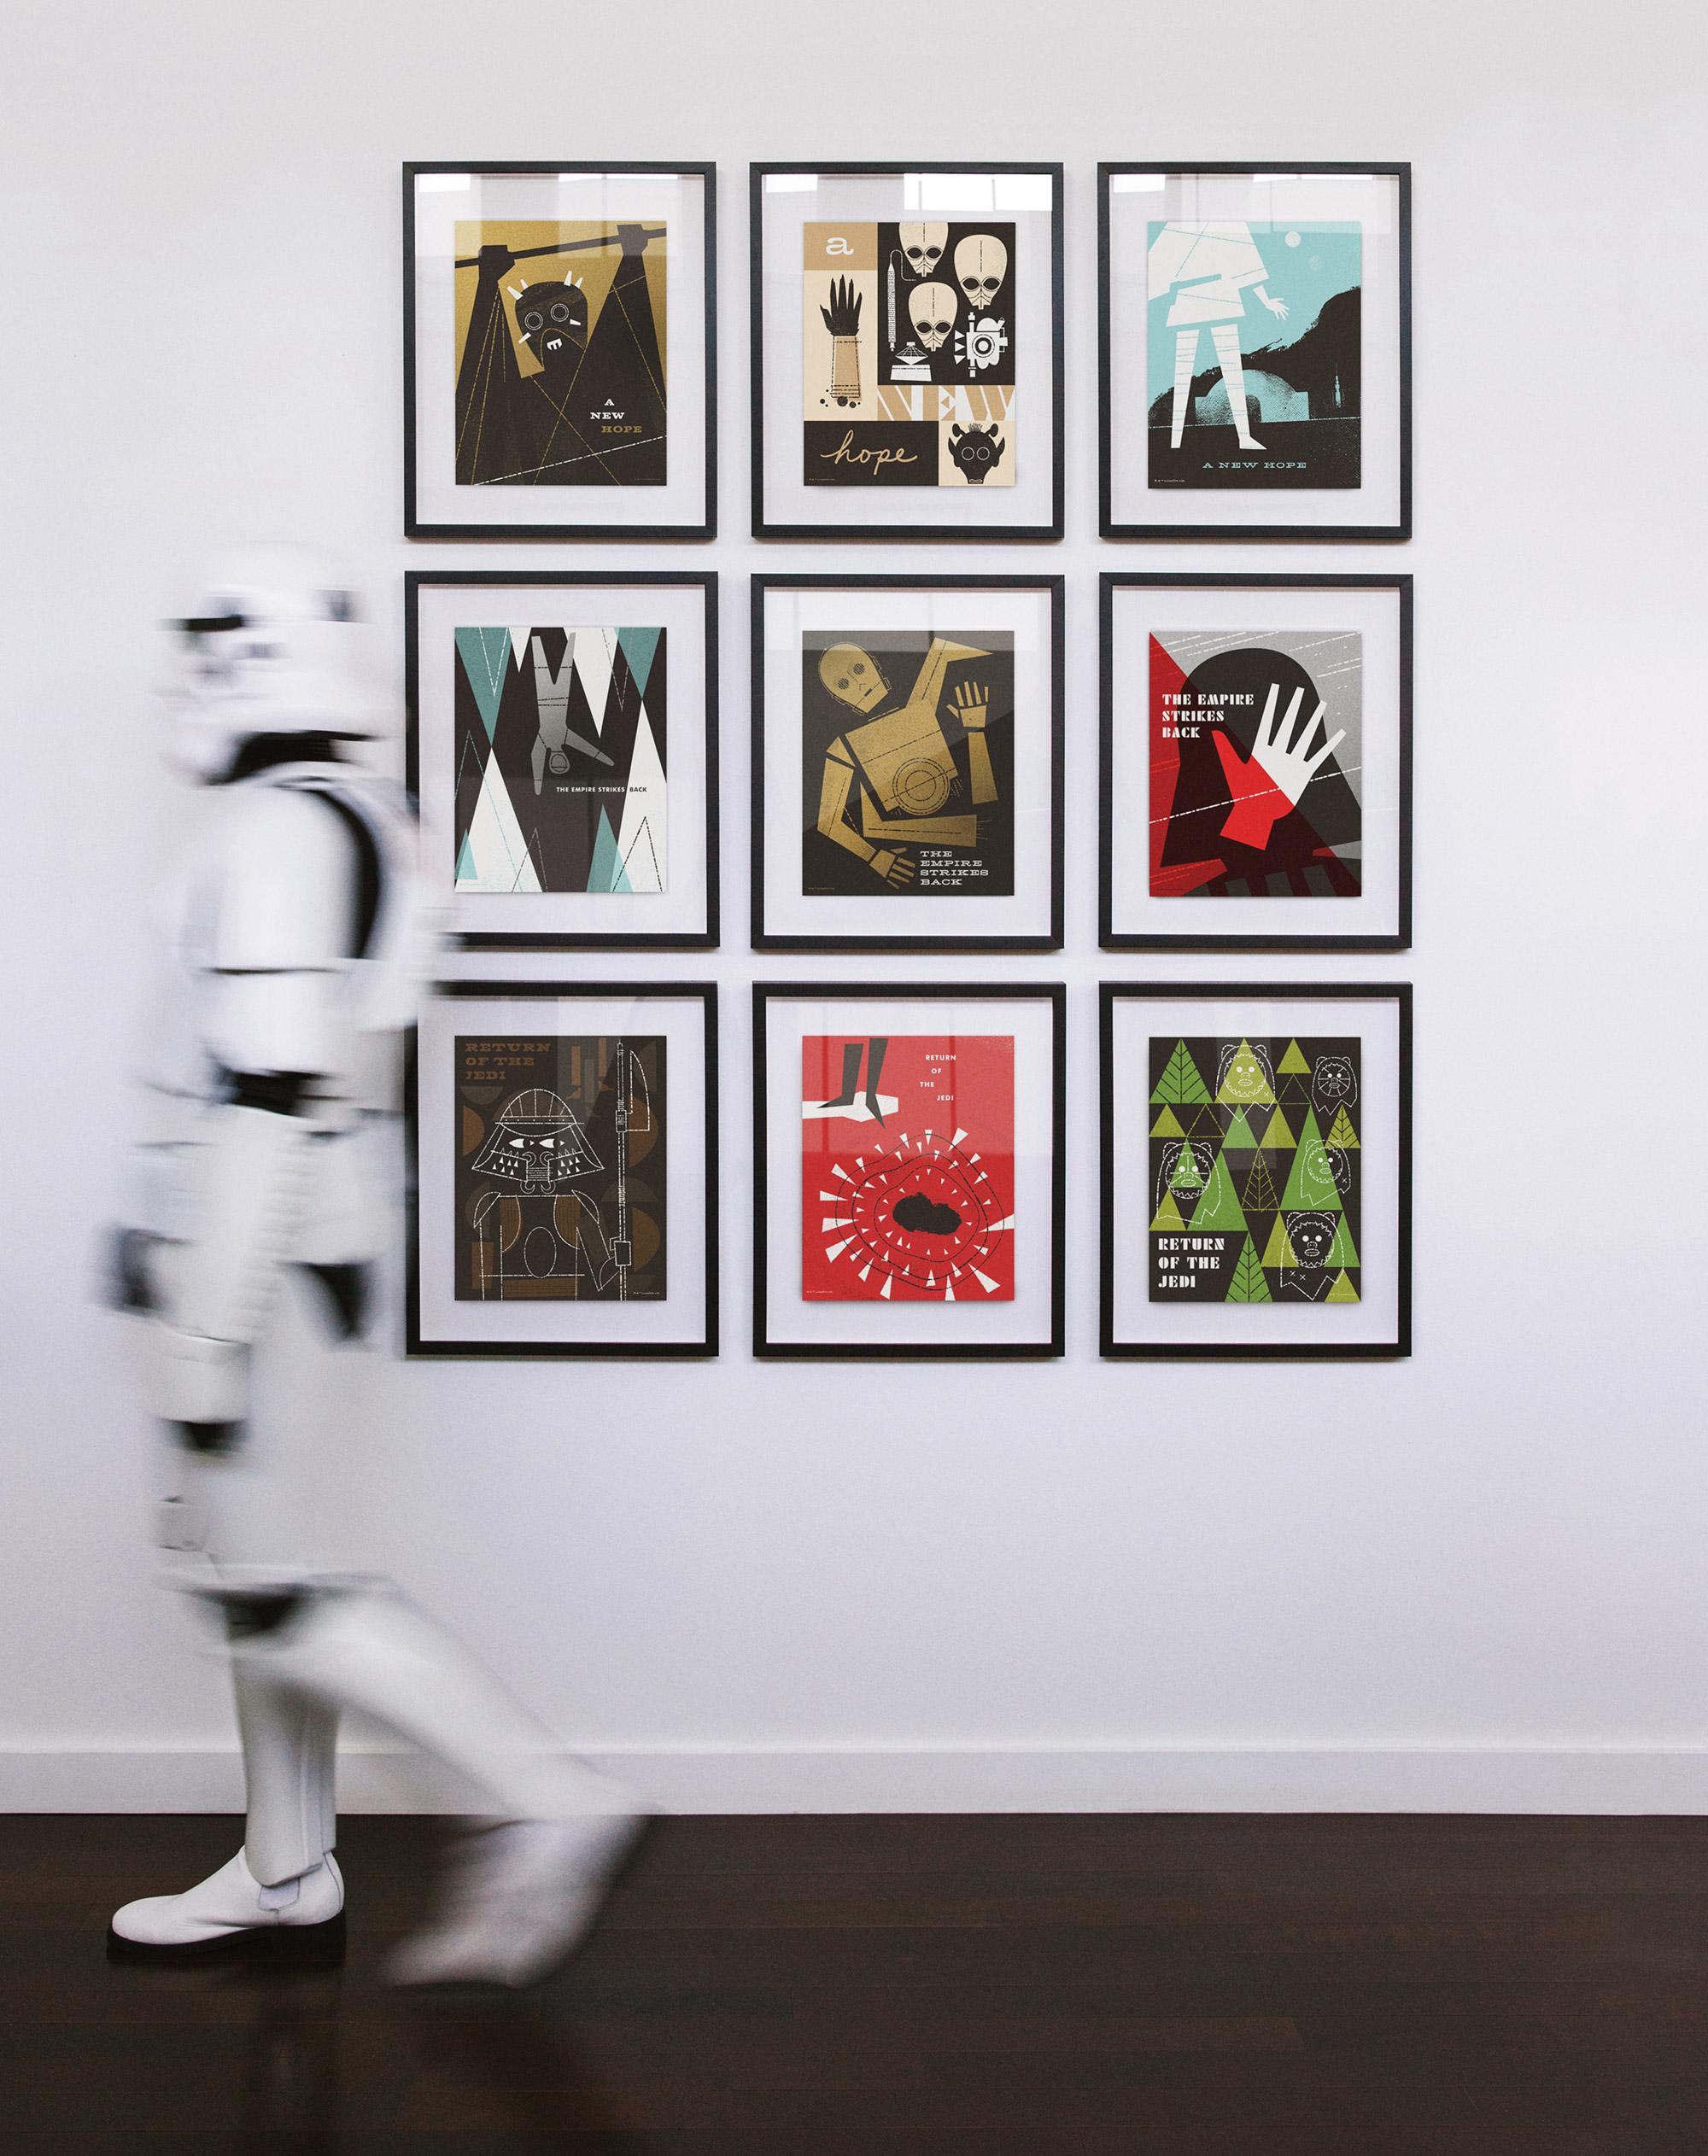 star-wars-ty-mattson-storm-trooper